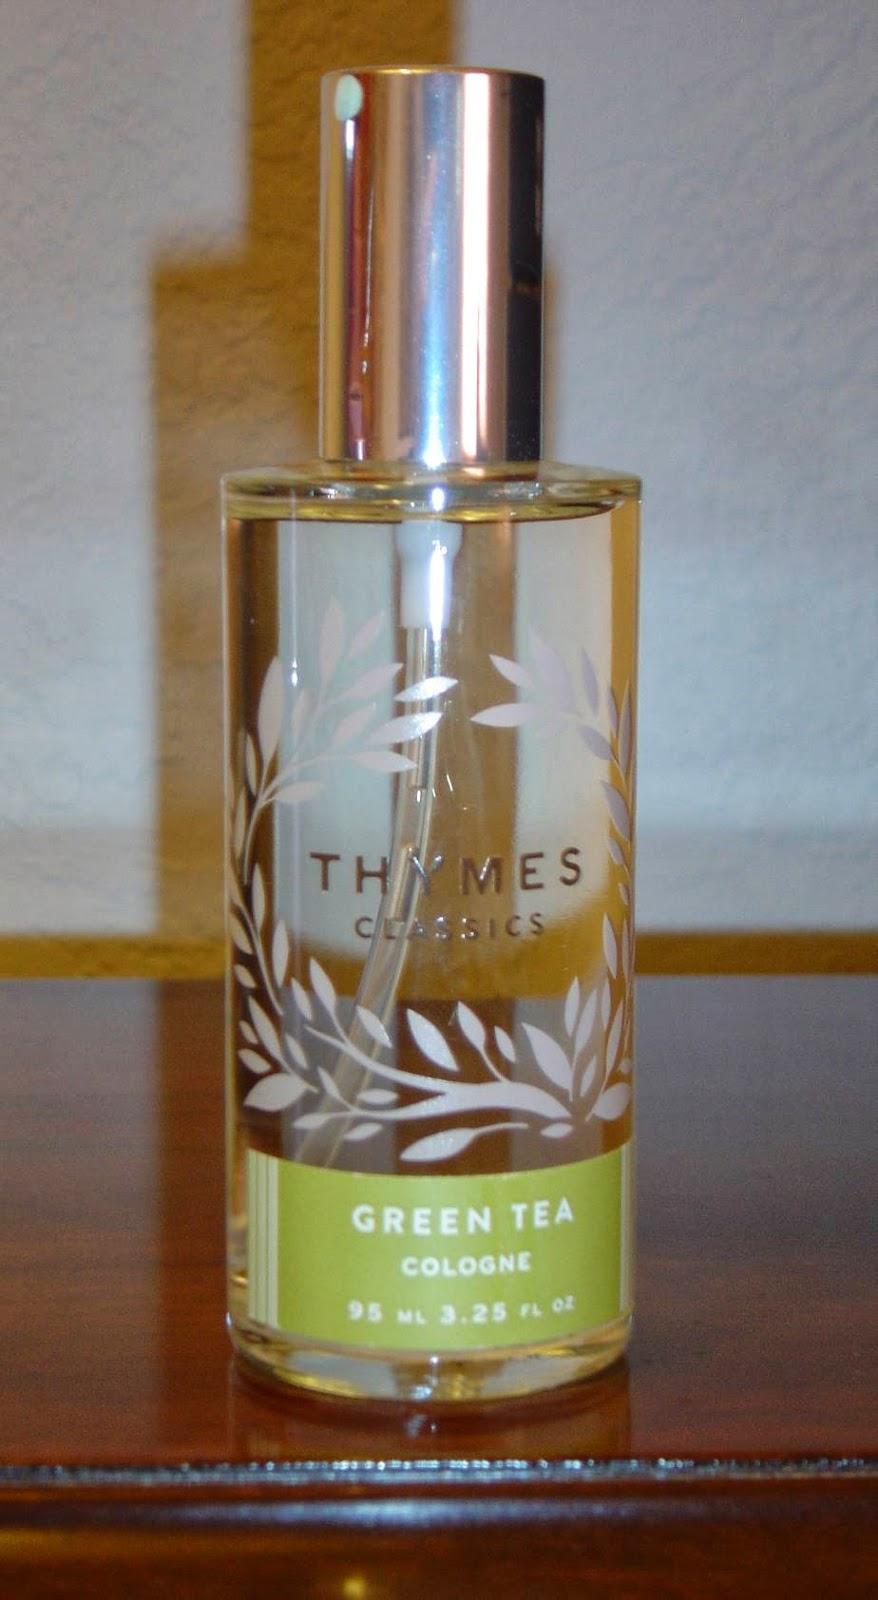 Thymes Classics Green Tea Cologne.jpeg